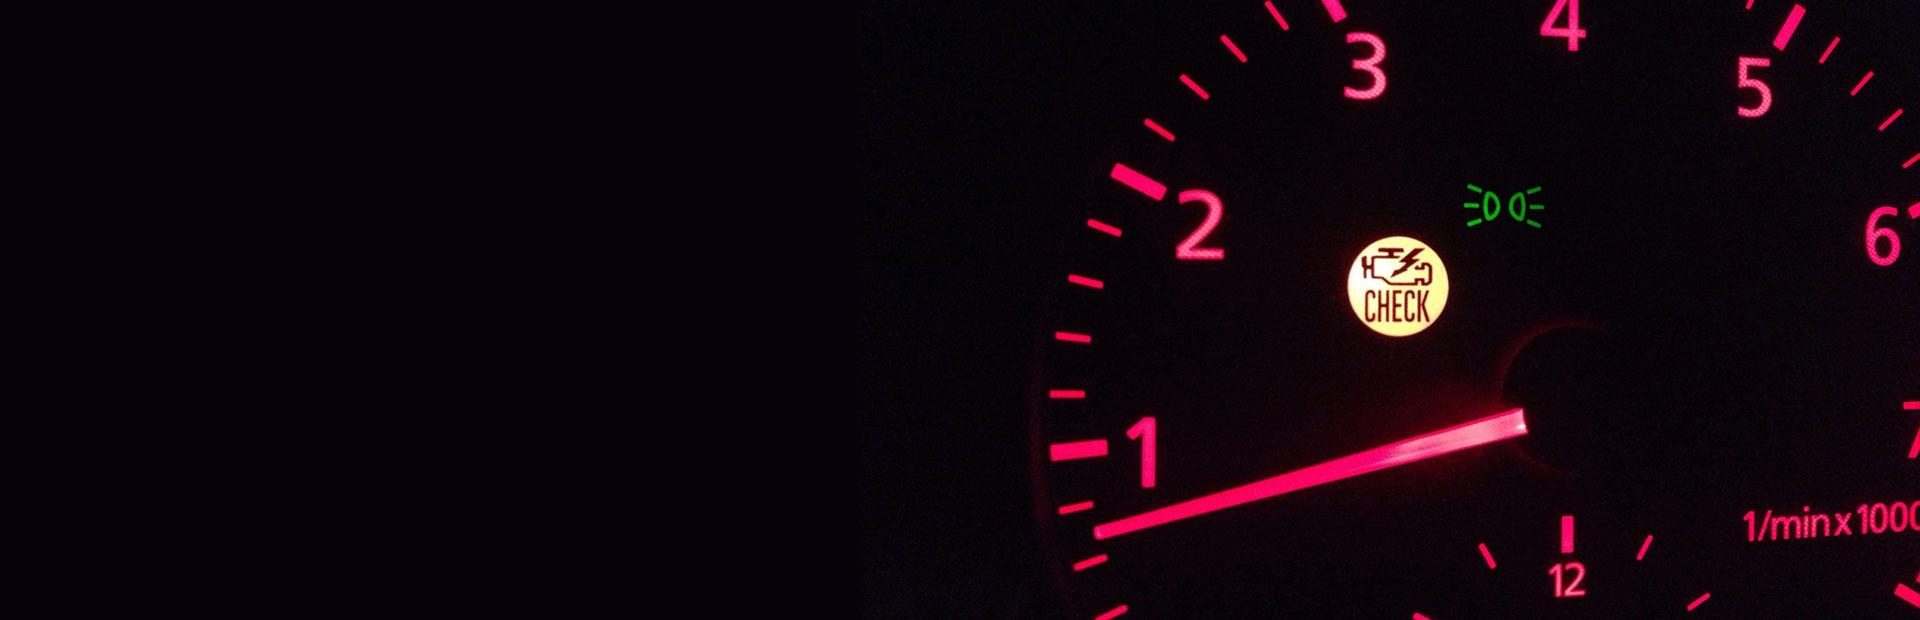 German Auto Check Engine Light Service